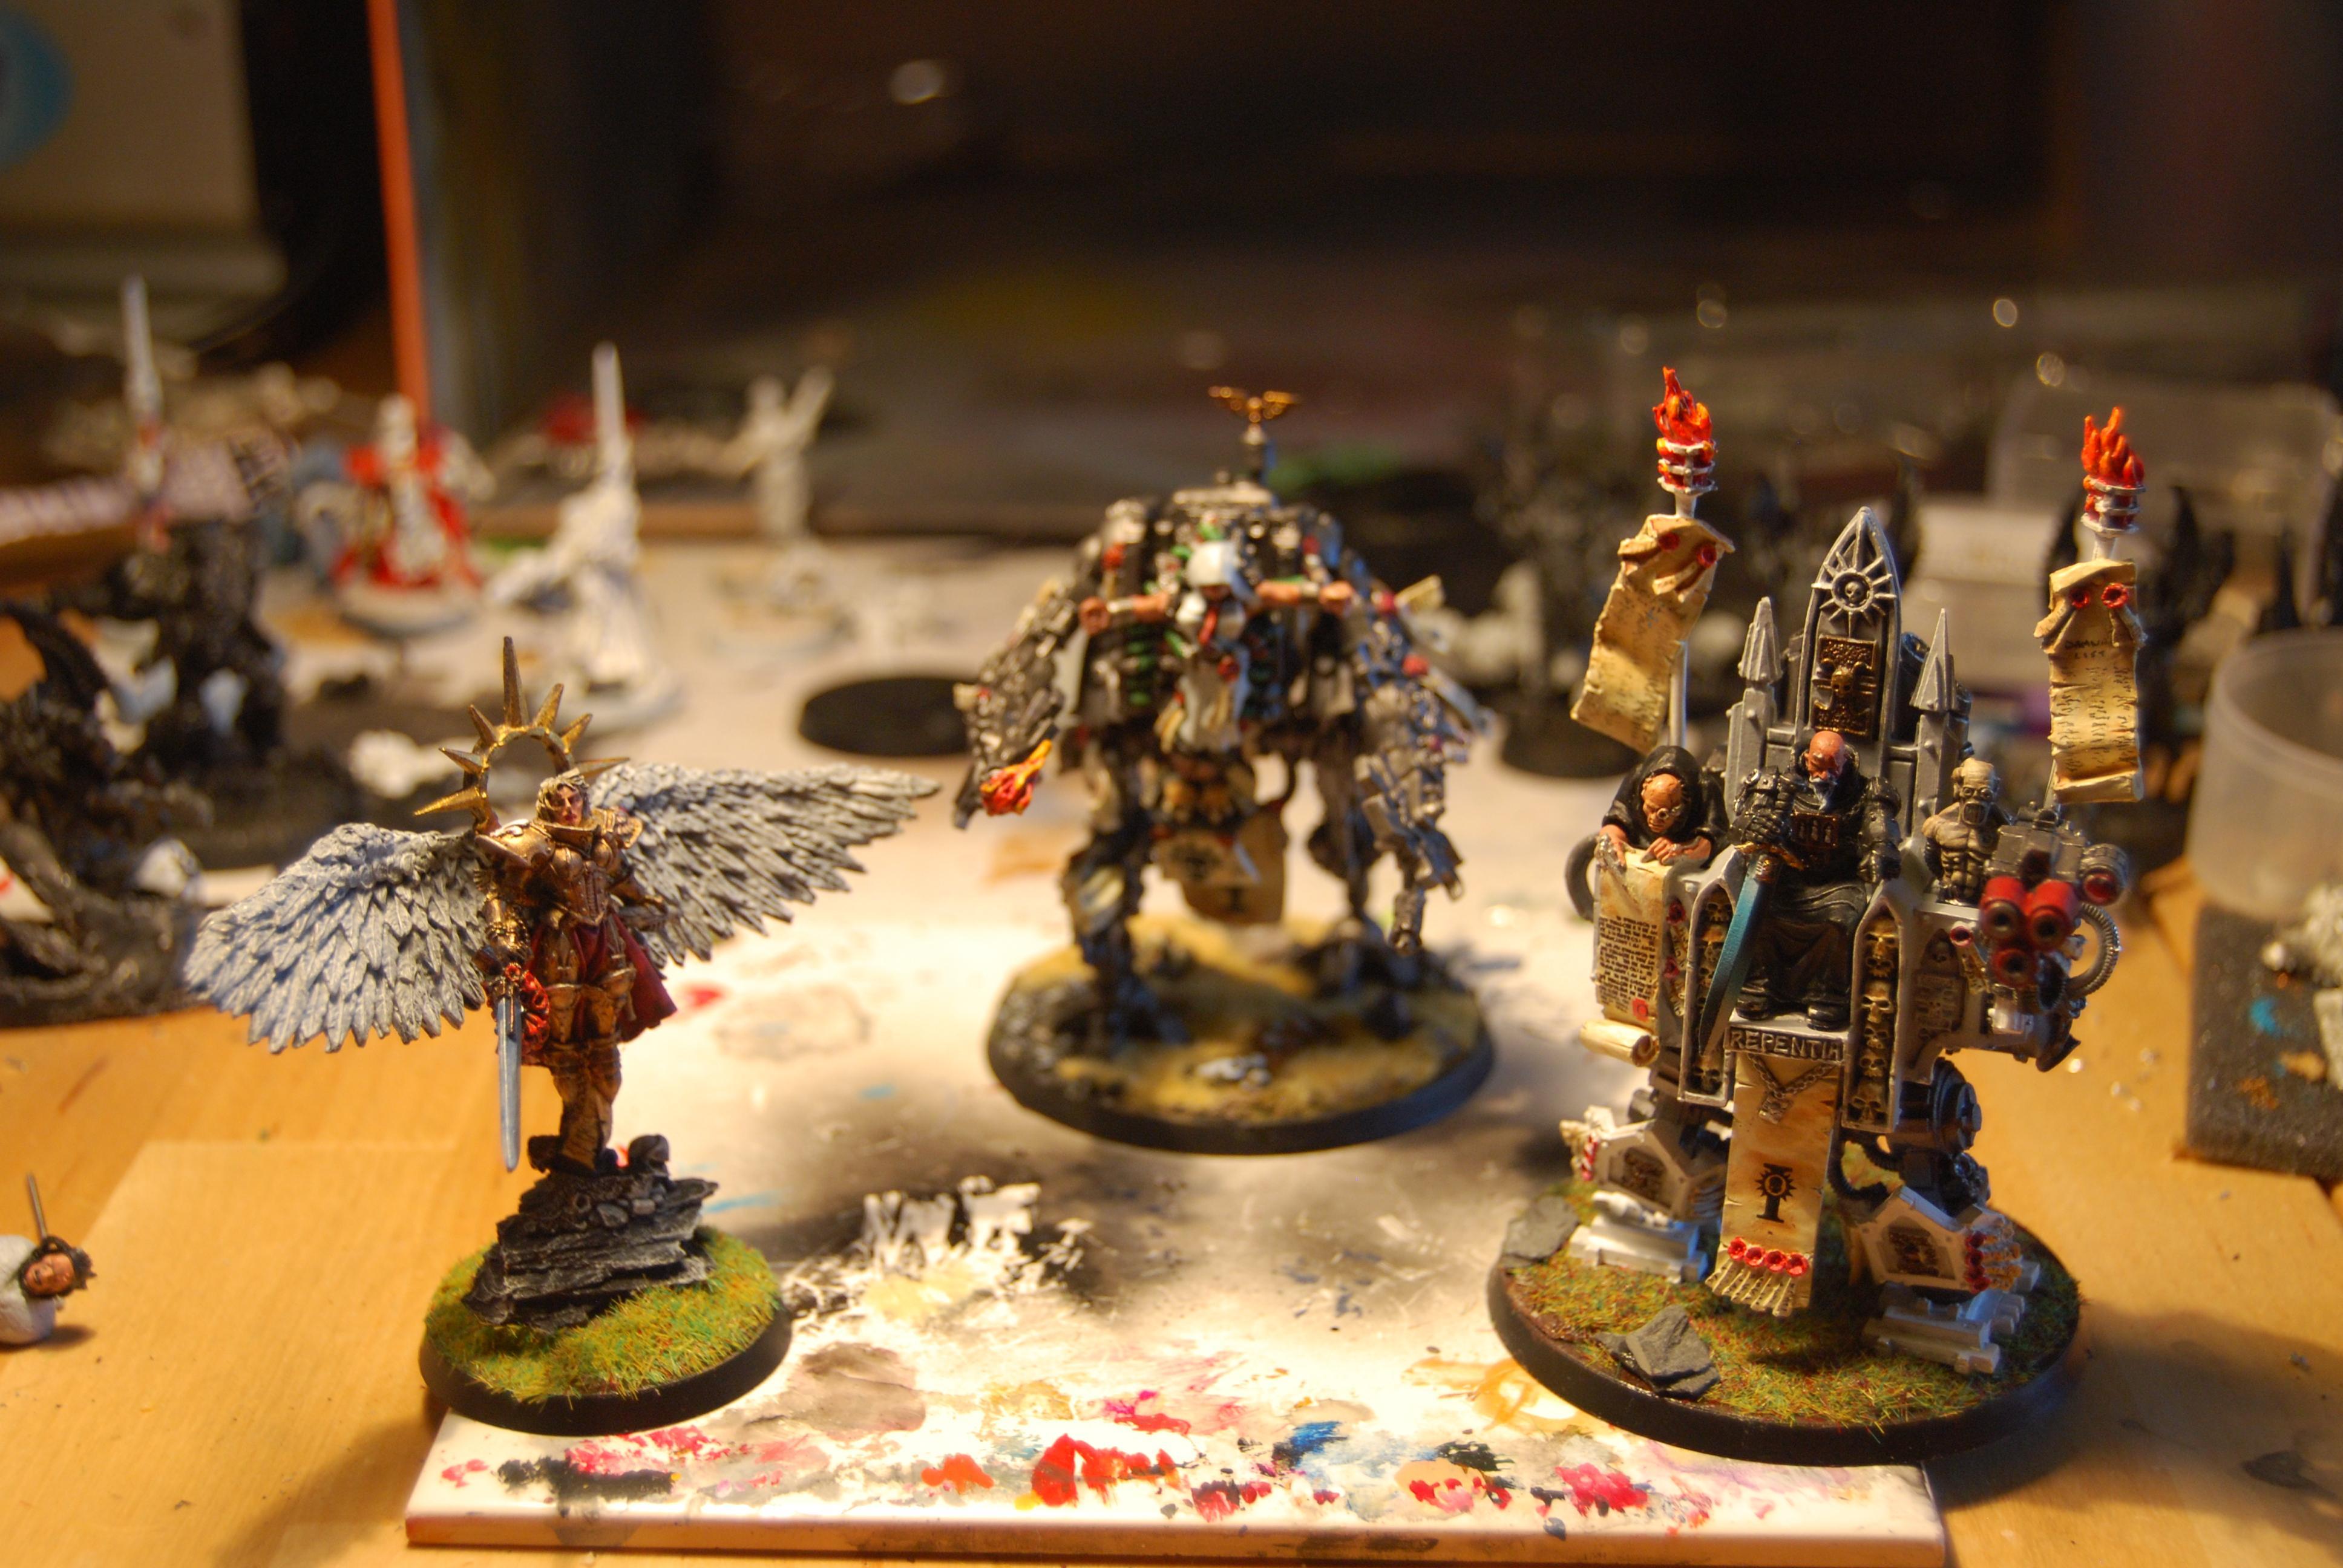 Inquisition, Karamazov, Living Saint, Pentinent Machine, Saint Celestine, Sisters Of Battle, Walking Throne, Warhammer 40,000, Witch Hunters